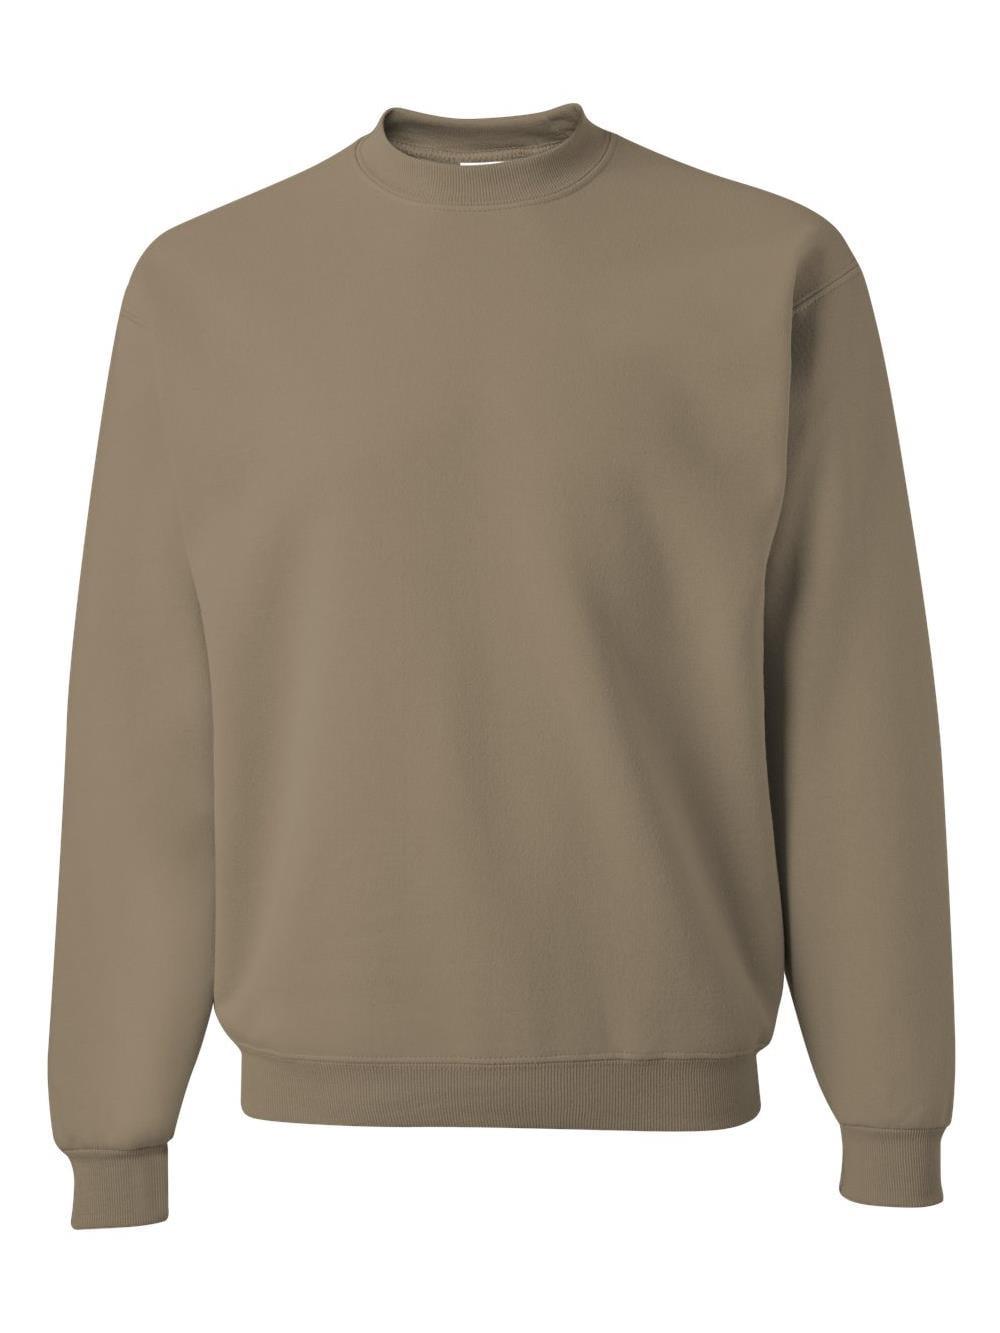 Jerzees NuBlend Crewneck Sweatshirt. Maroon. XL.